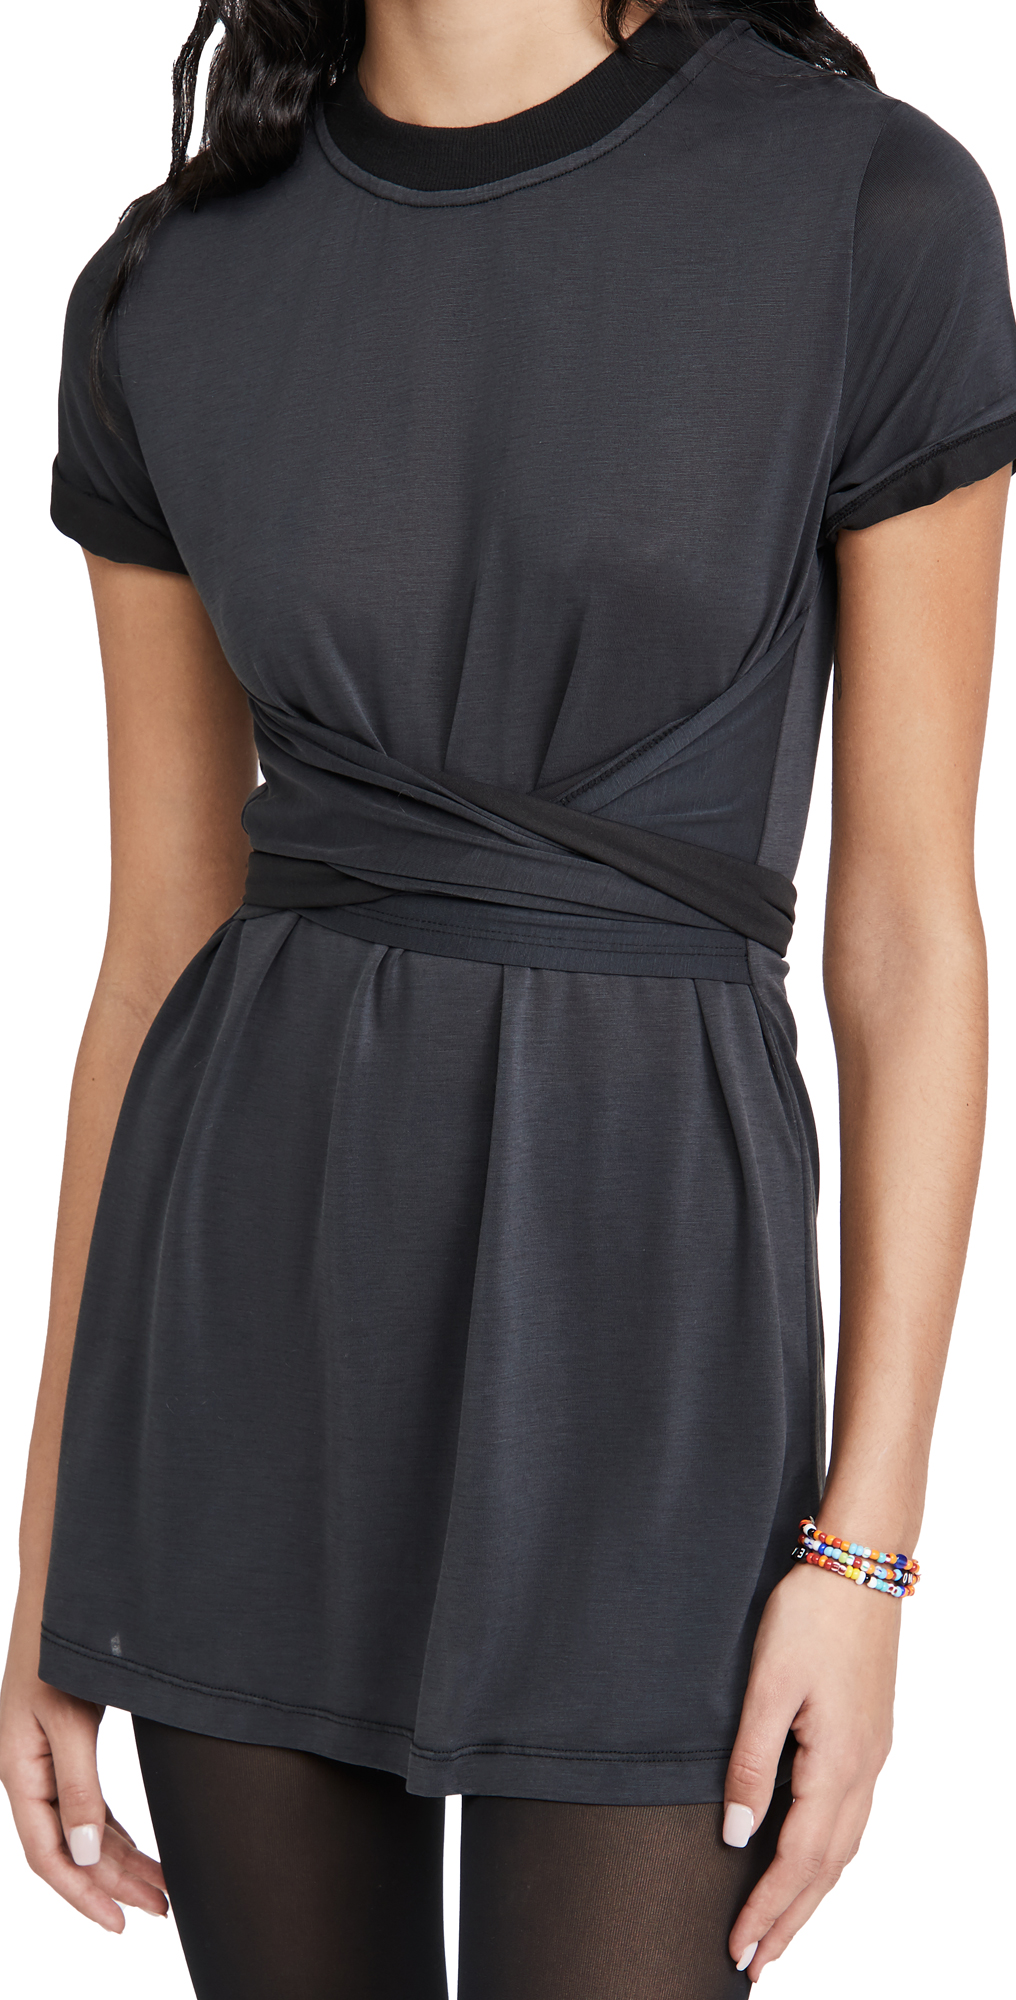 alice + olivia Jasset Roll Cuff Tie Back Dress